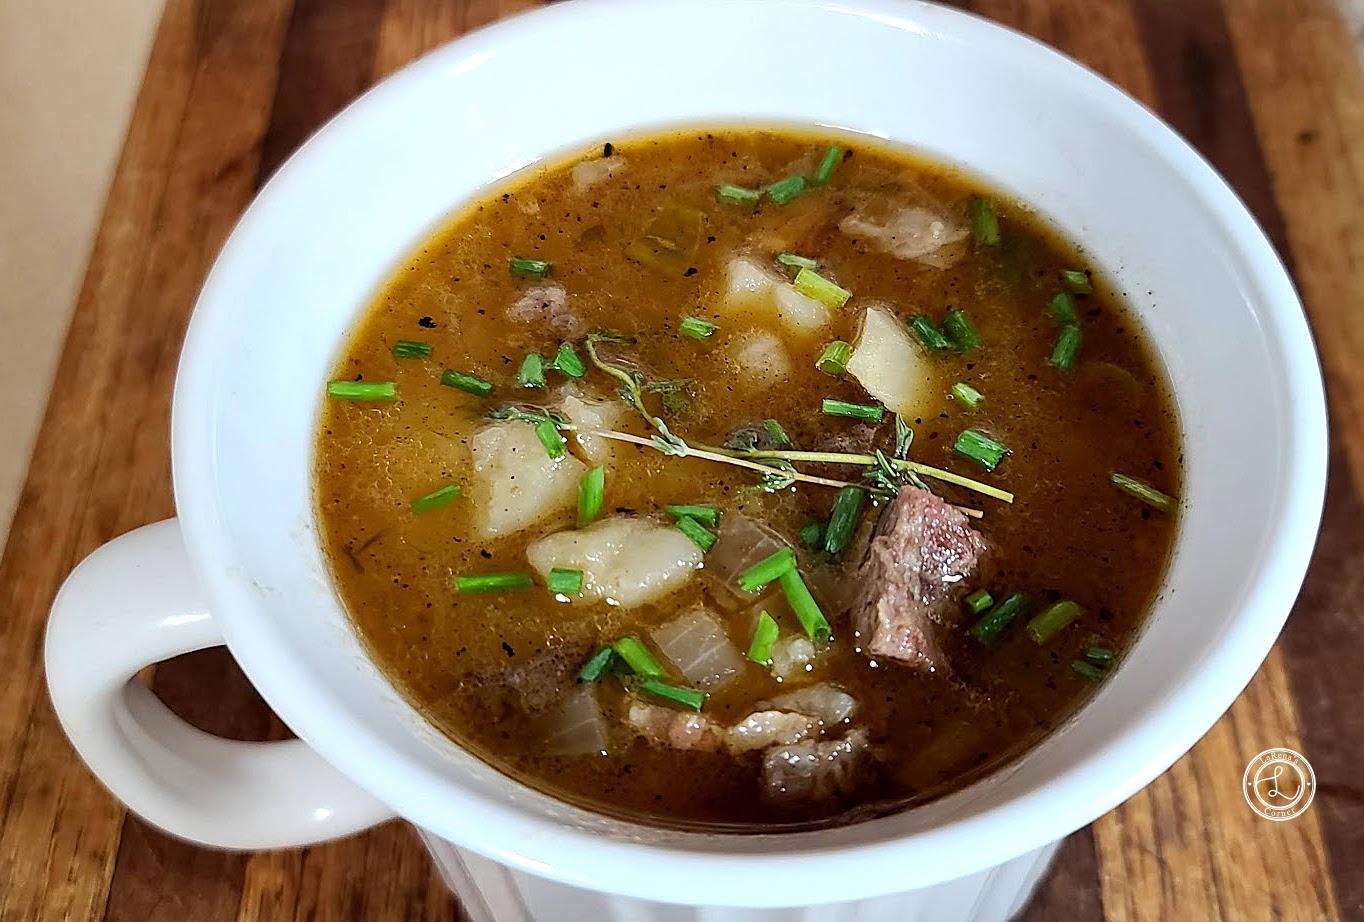 Close up of Steak & Potato Soup